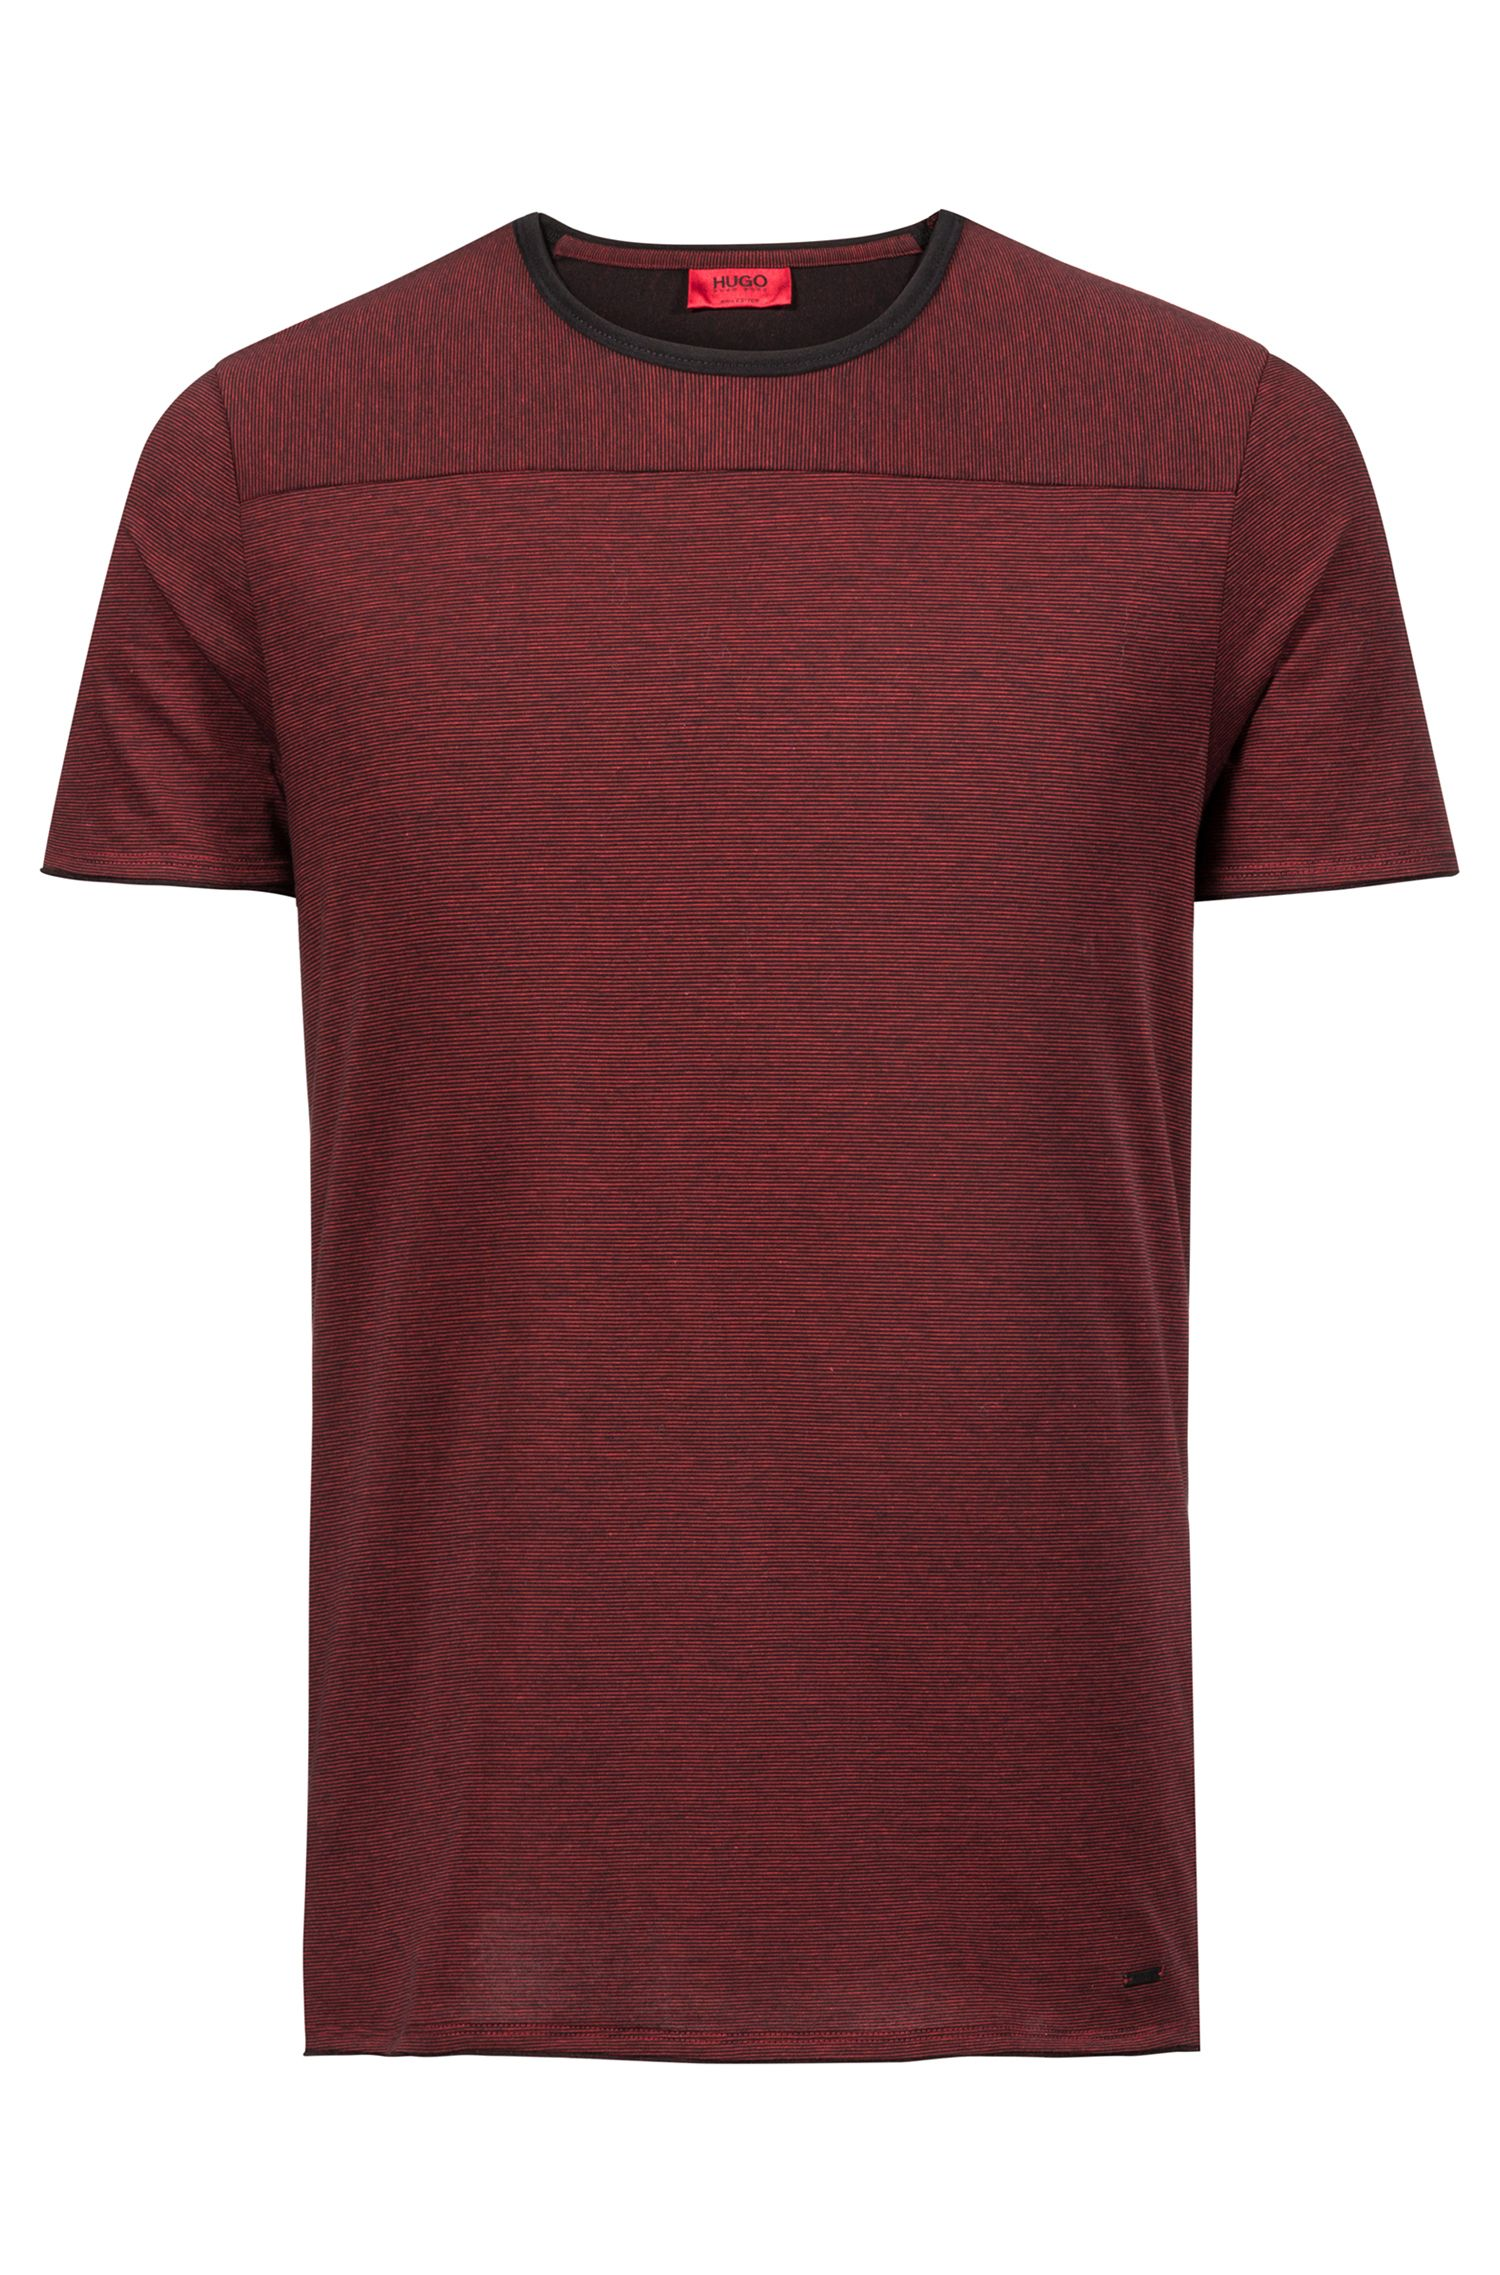 Crew-neck T-shirt in Pima cotton with spliced stripes, Black